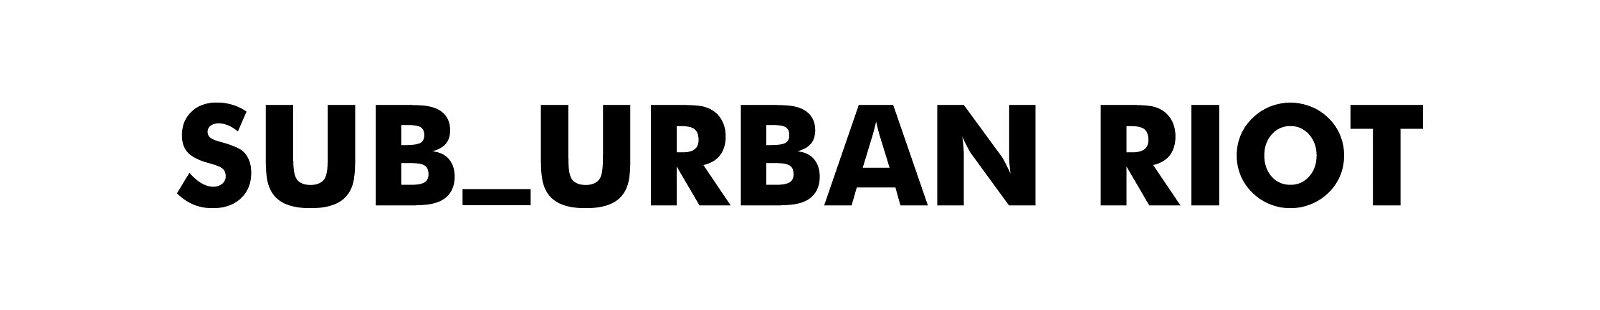 SUB_URBAN RIOT